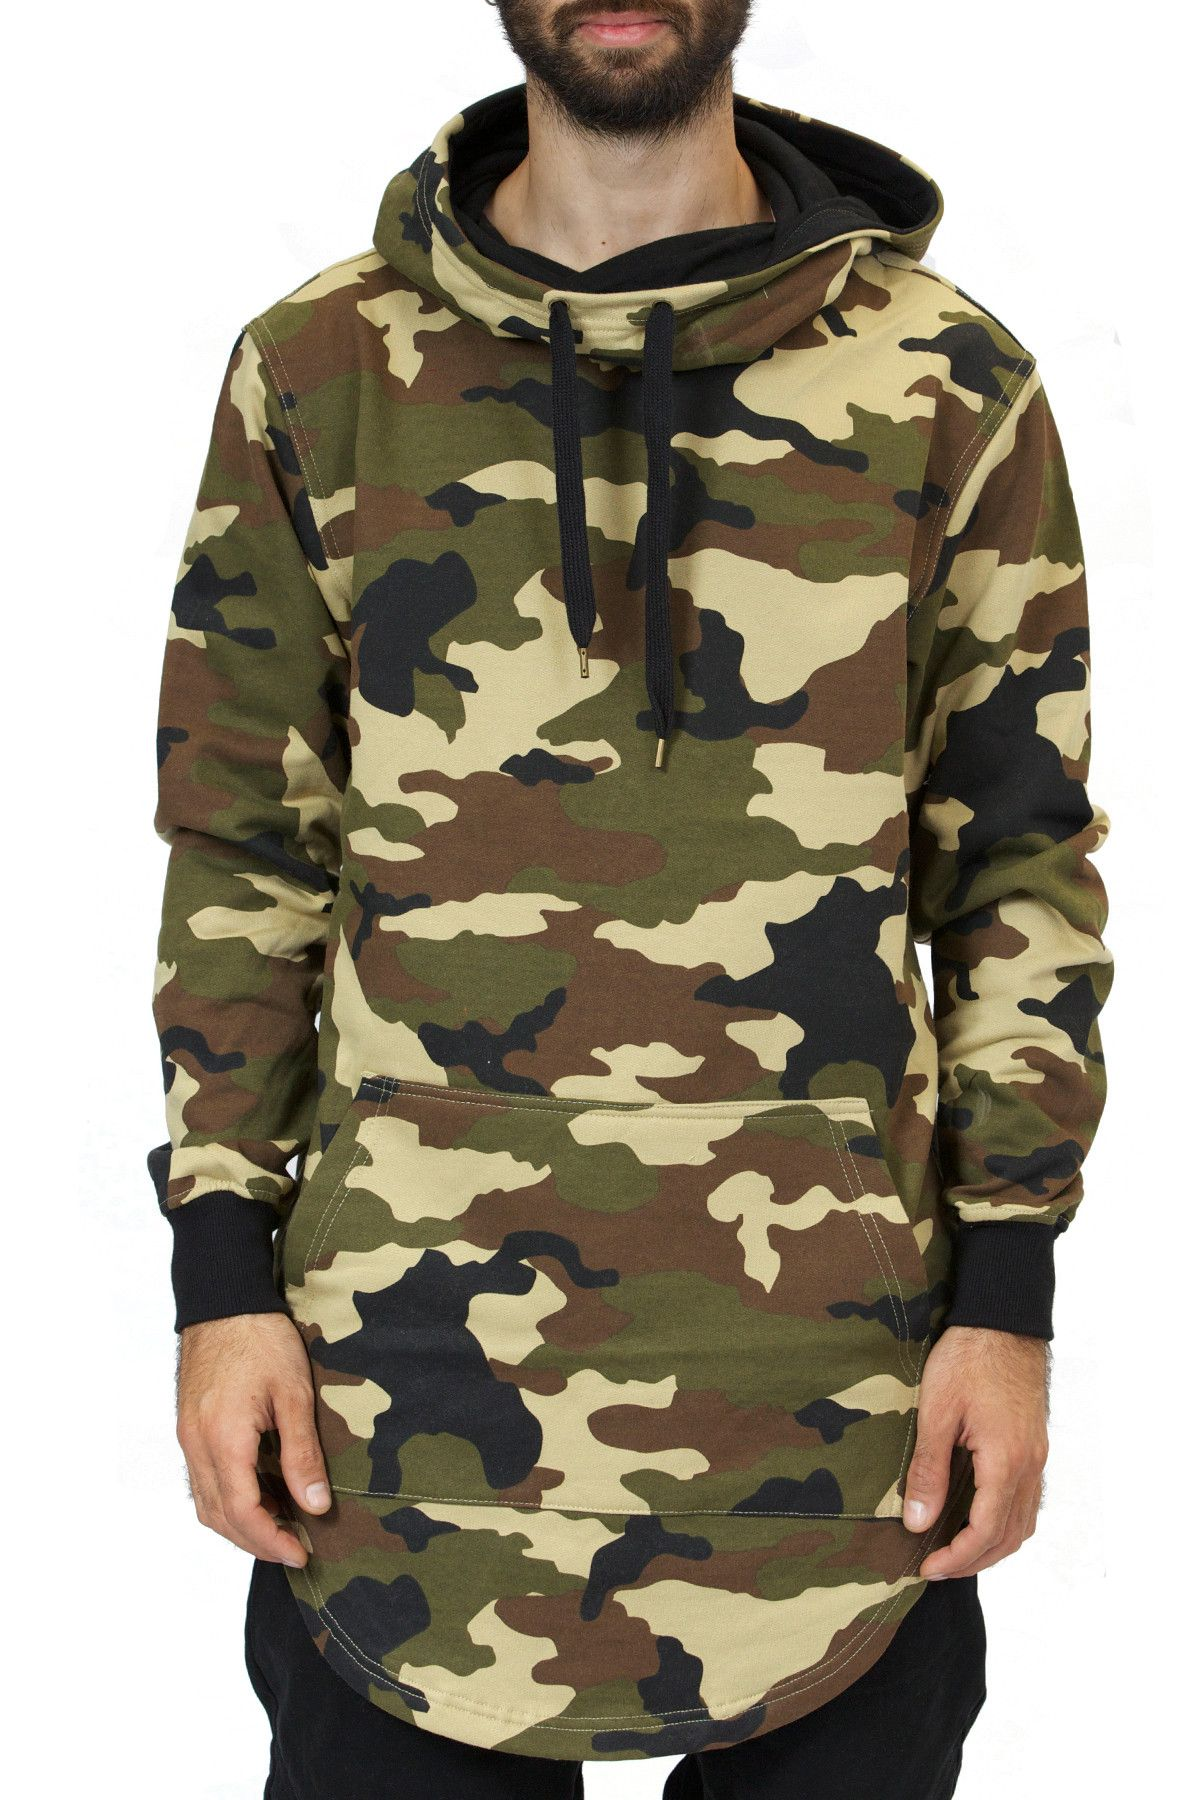 74e4b0473bd13 Elongated Cowl Neck Hoodie in Camo – Fashion X Freedom Camo Fashion,  Military Fashion,